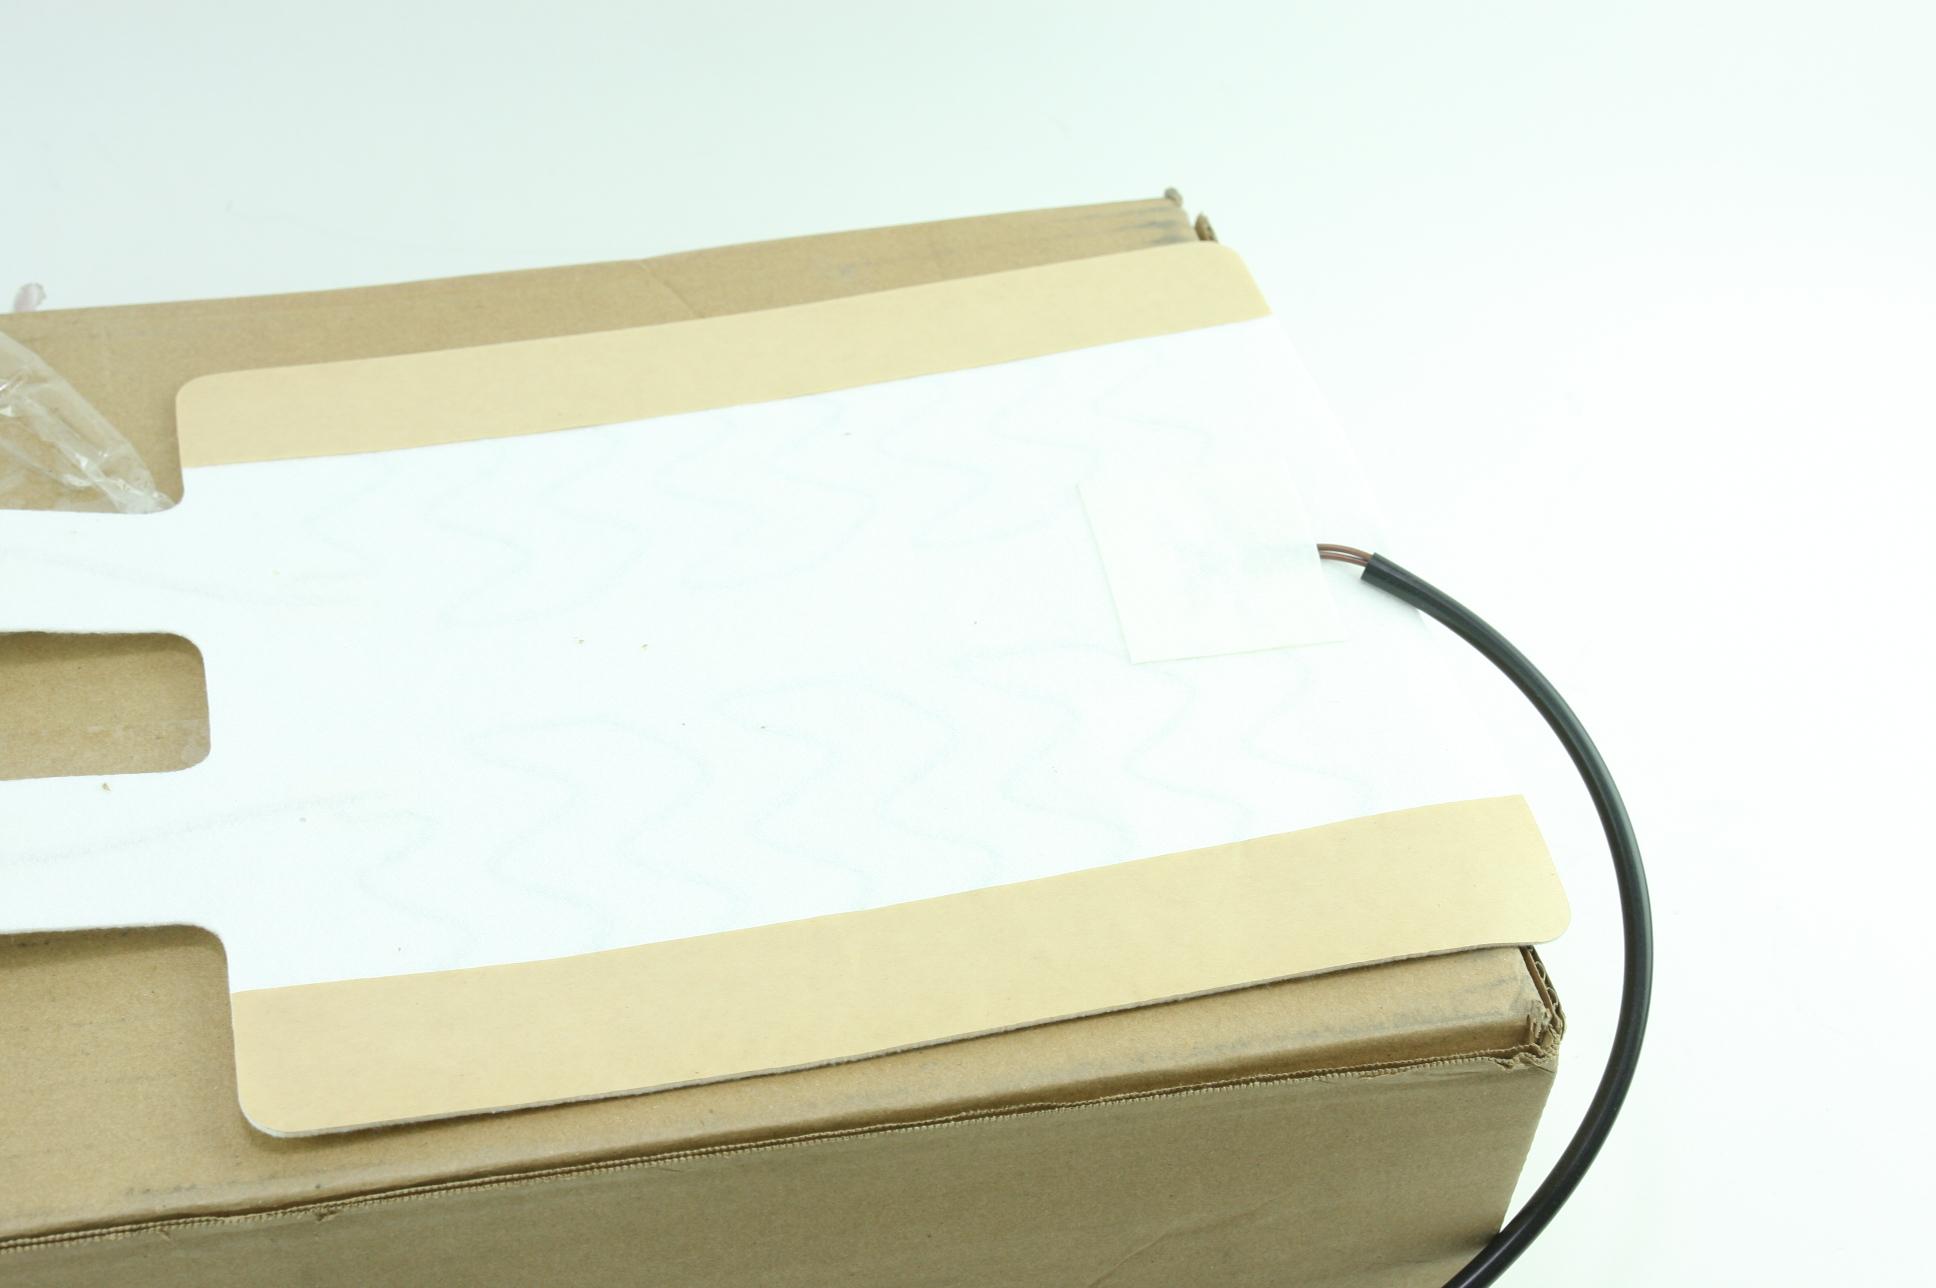 New Genuine OEM 88949407 GM Seat Heater Element Fast Free Shipping NIP - image 6